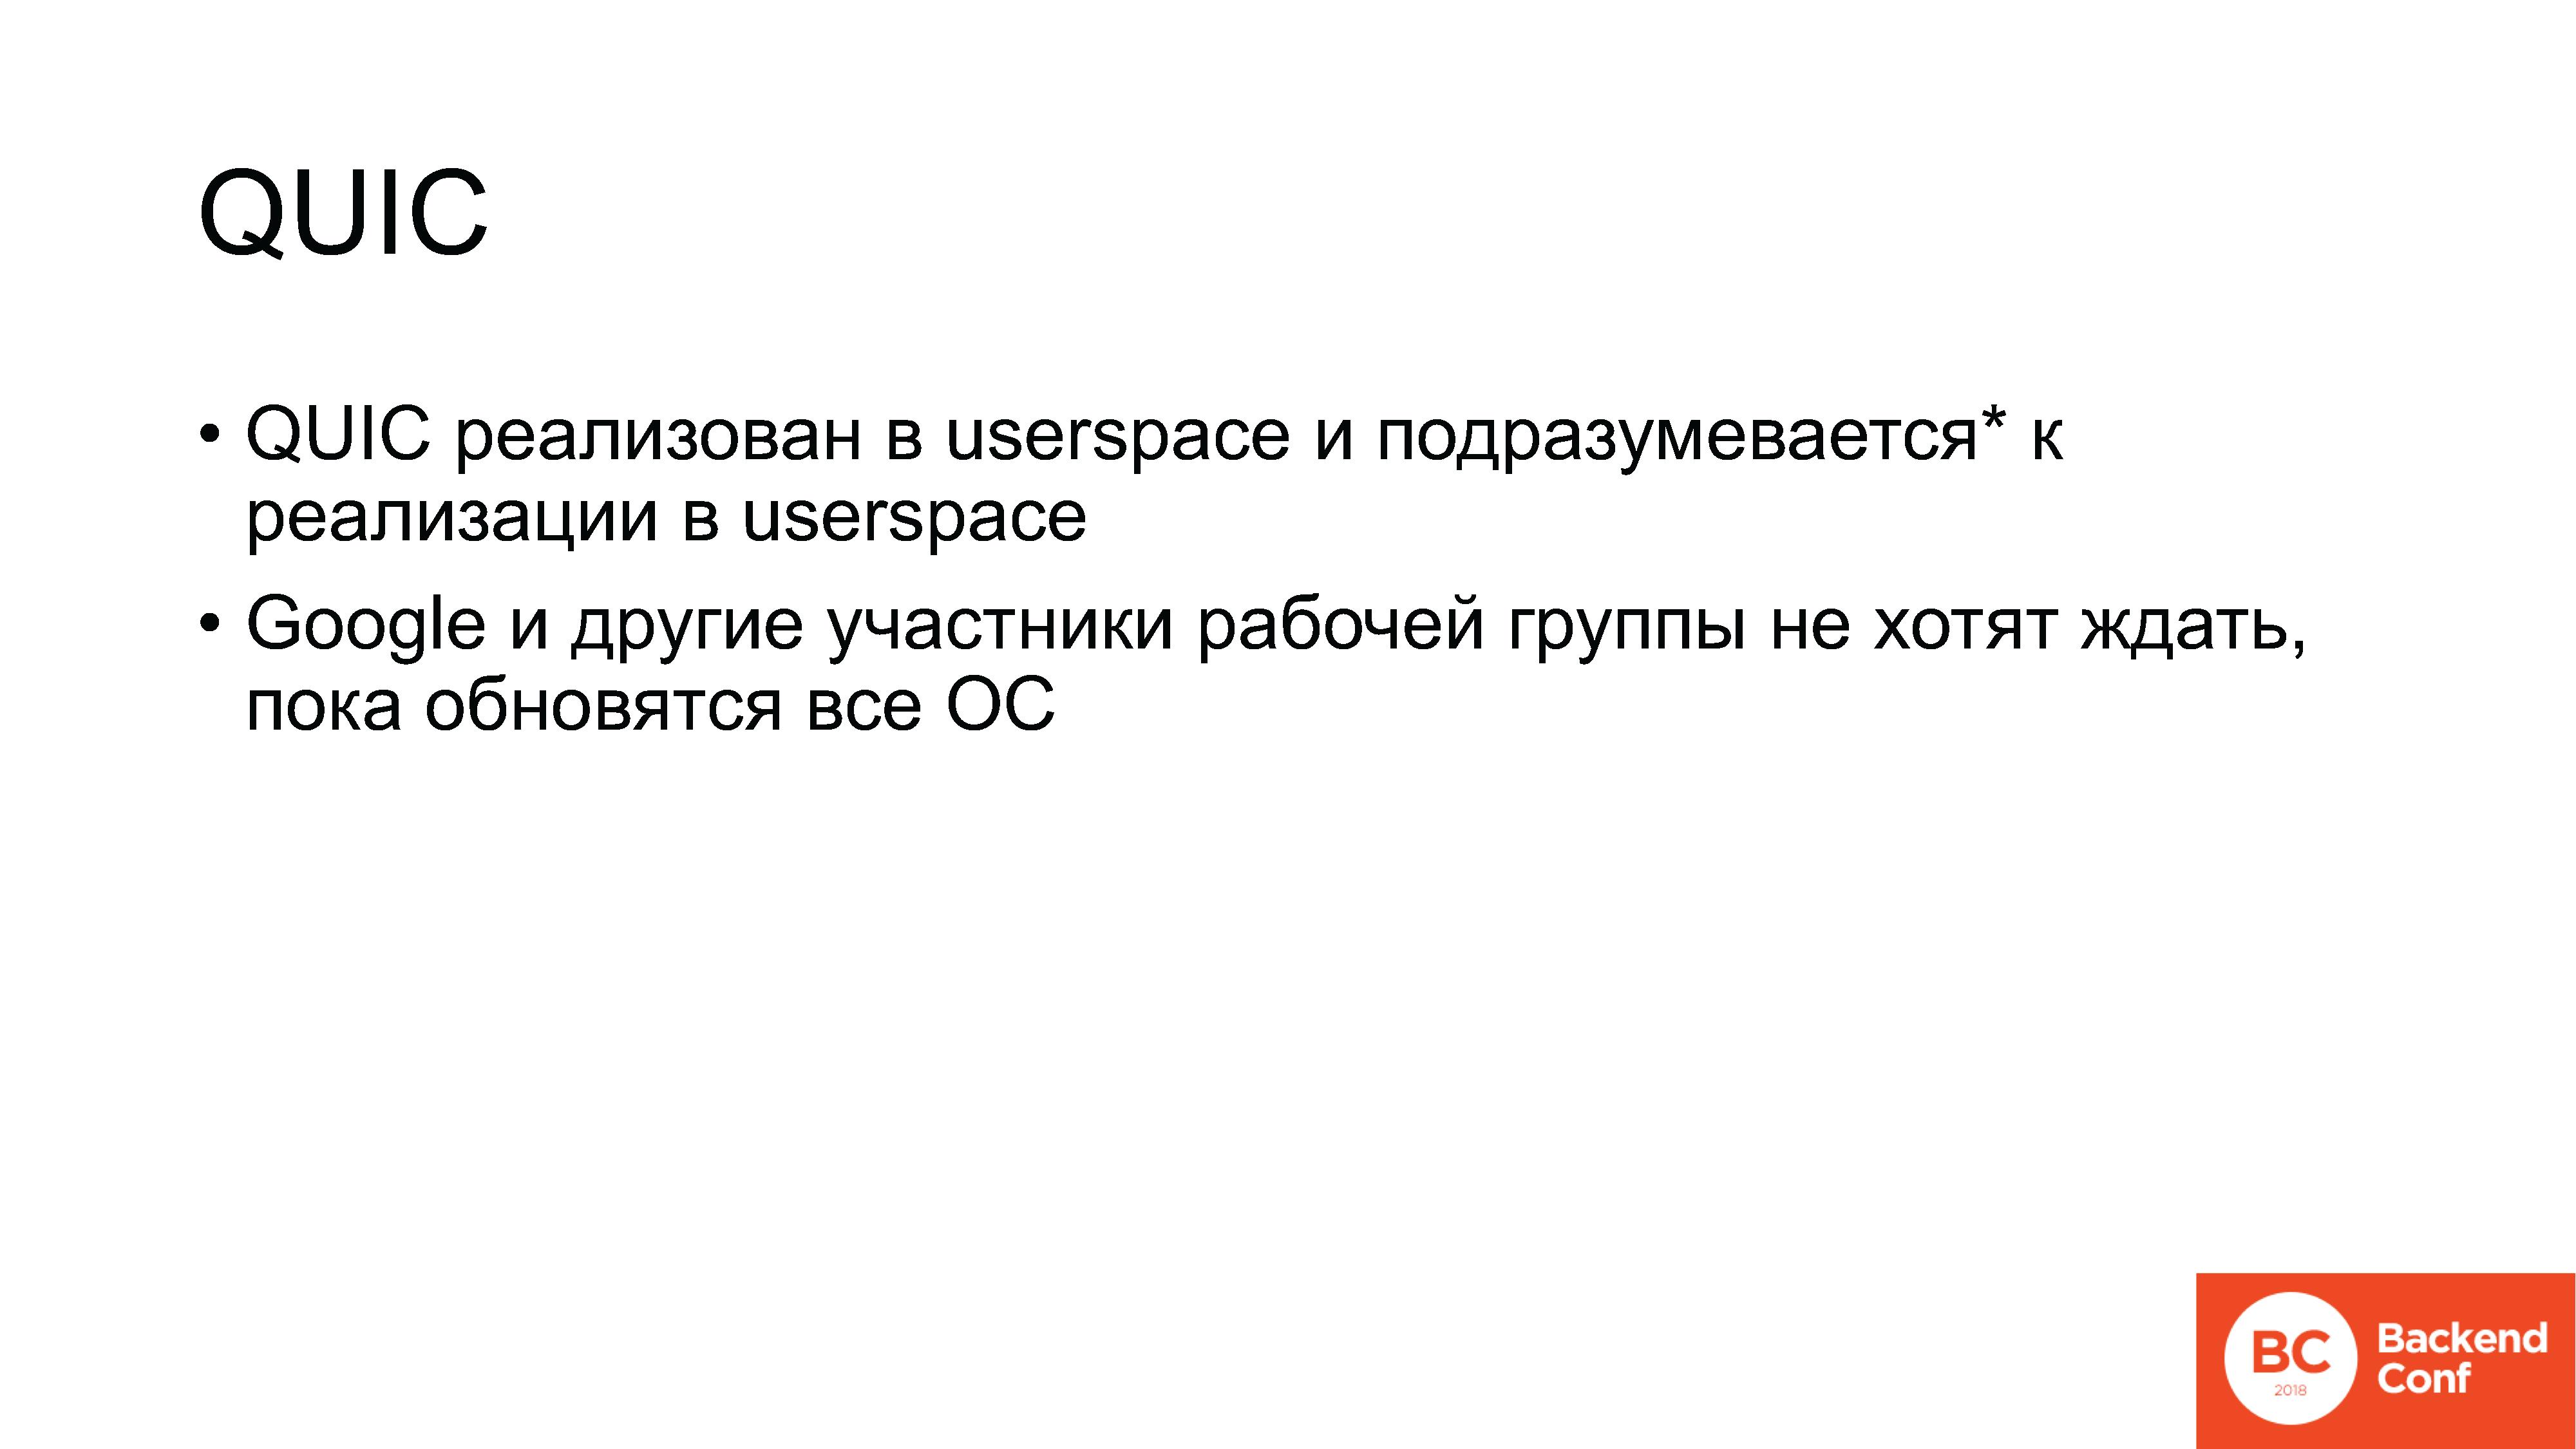 buqmt_x8oimytiwlu8vjovzg_rk.png